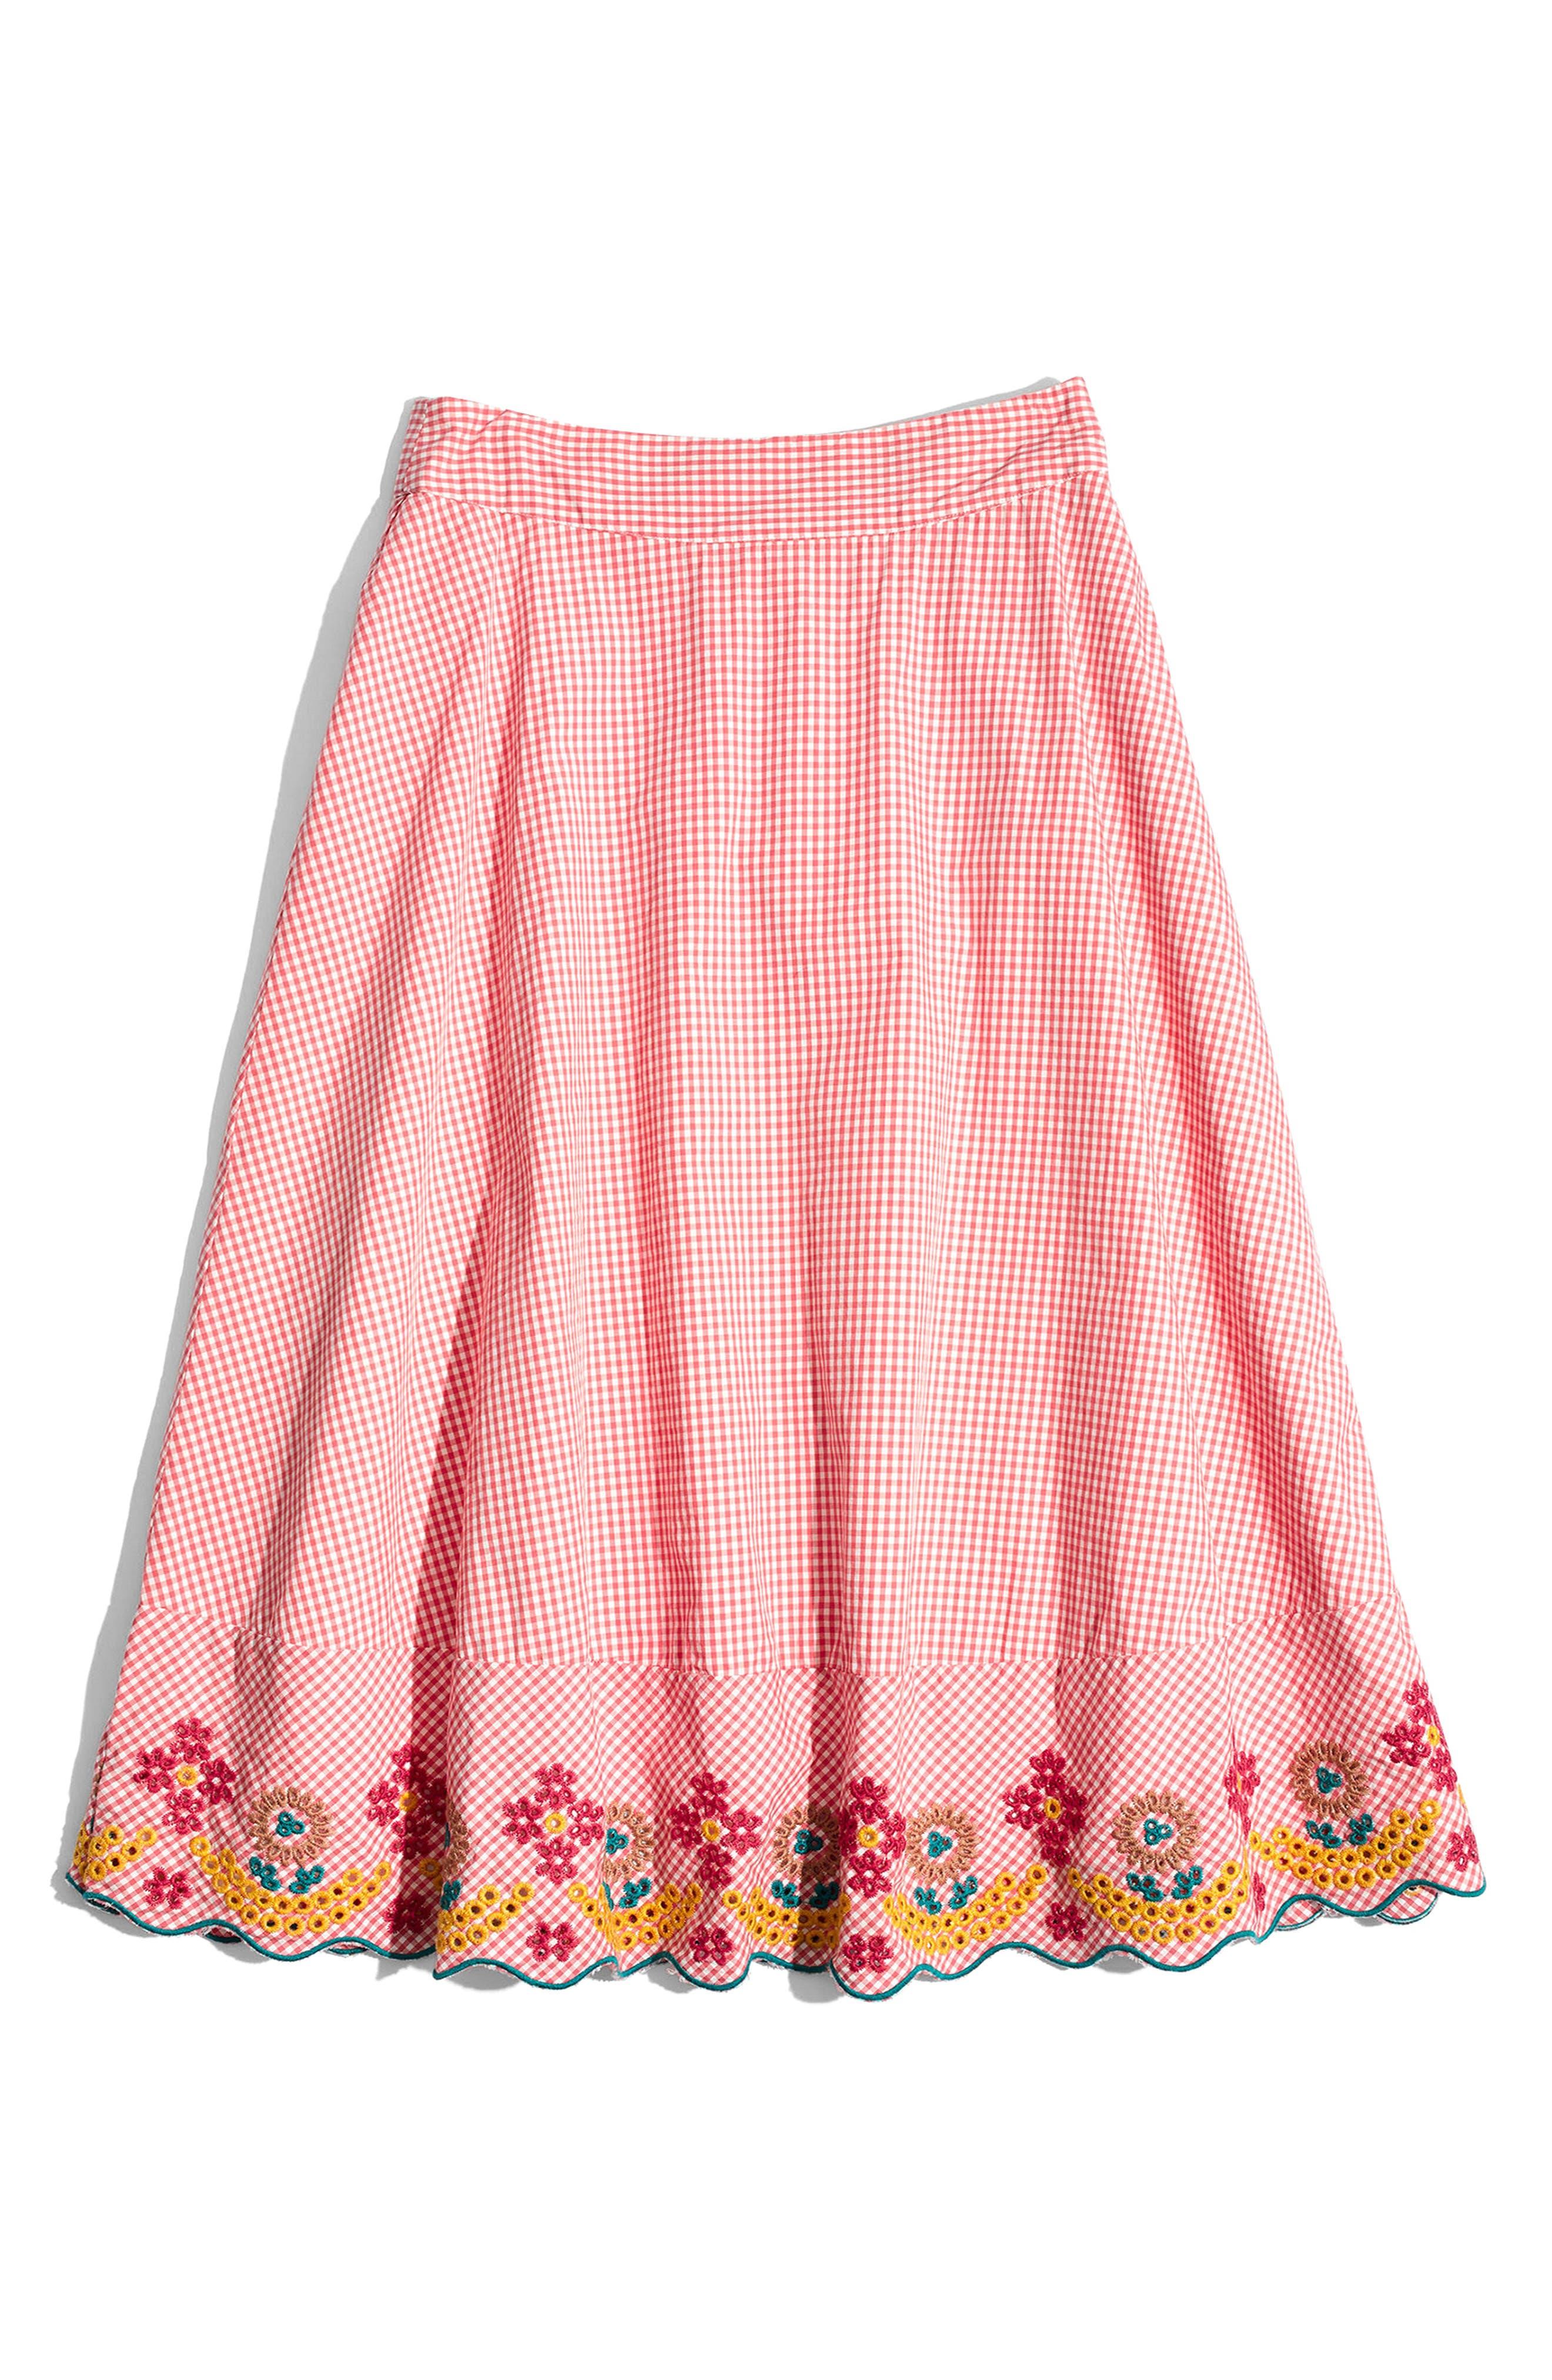 Embroidered Gingham Circle Skirt,                             Alternate thumbnail 4, color,                             650